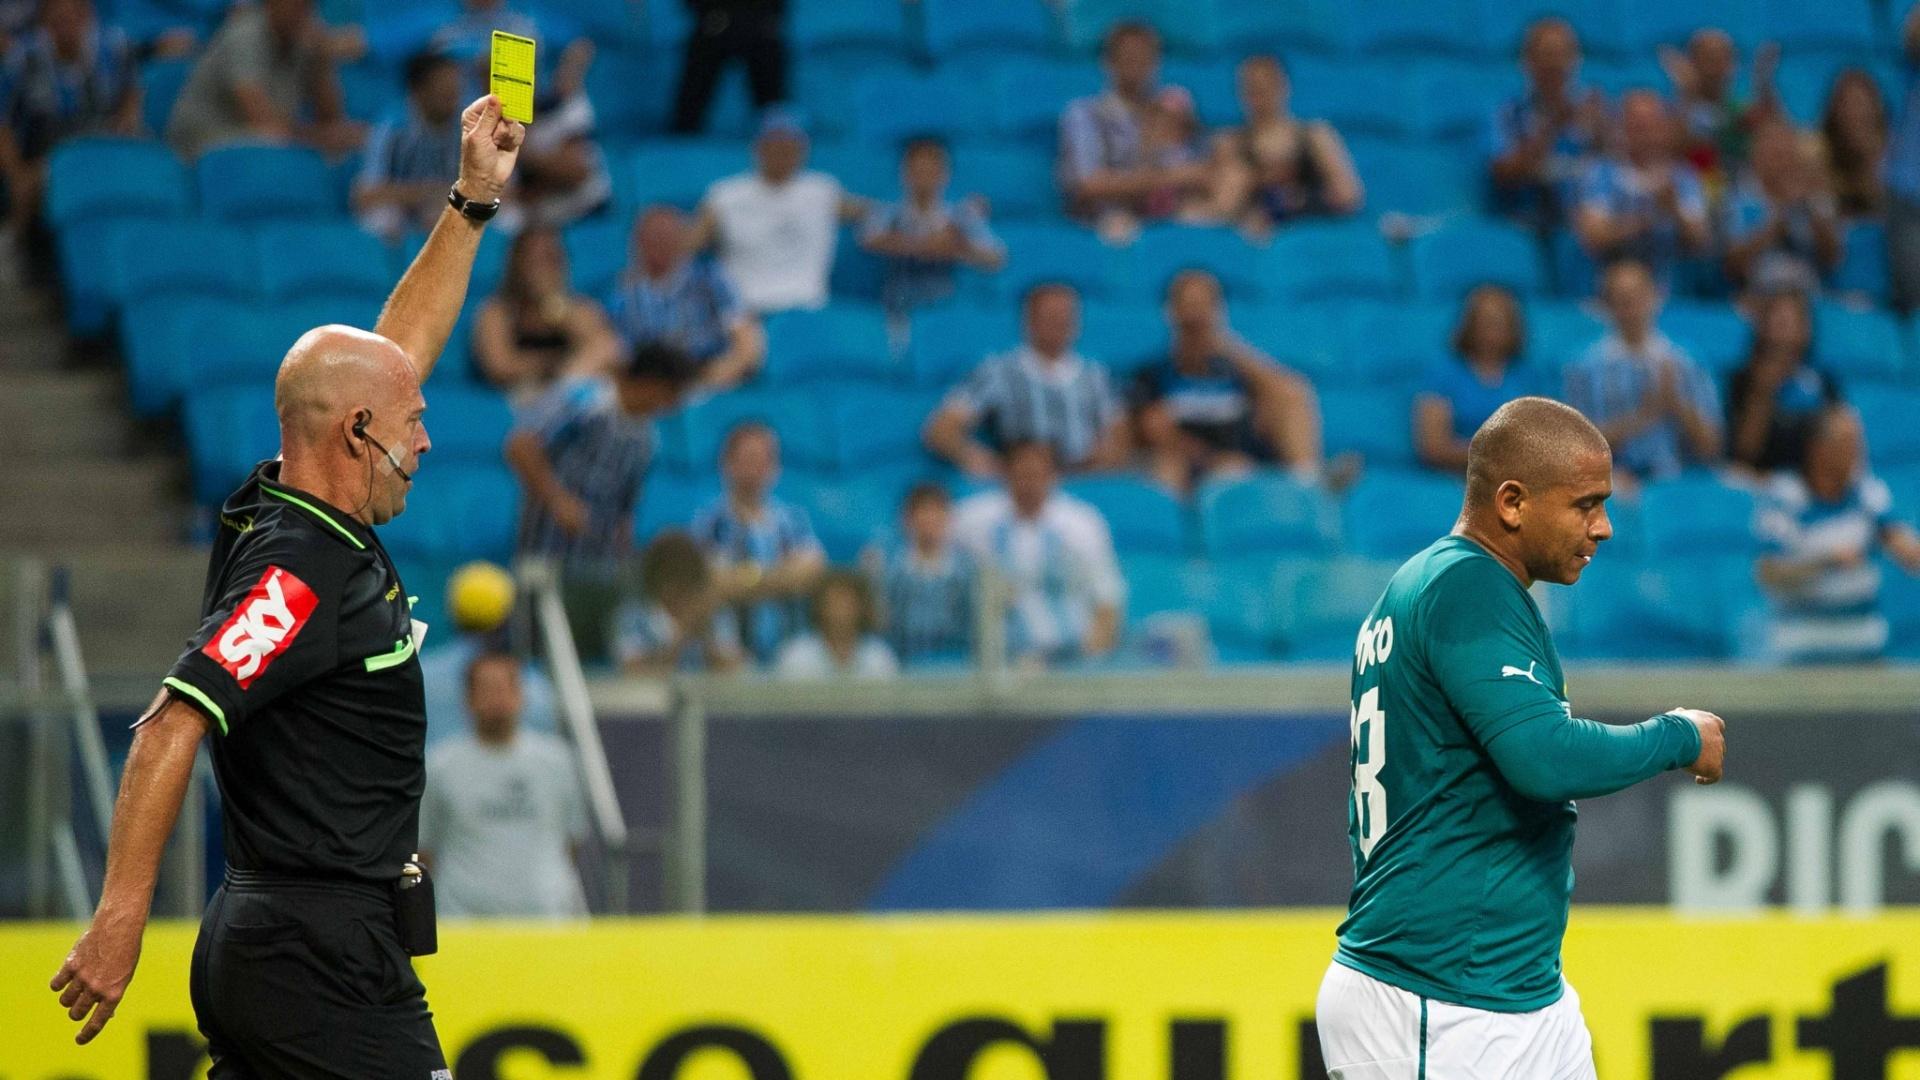 Heber Roberto Lopes mostra cartão amarelo para o atacante Valter, do Goiás